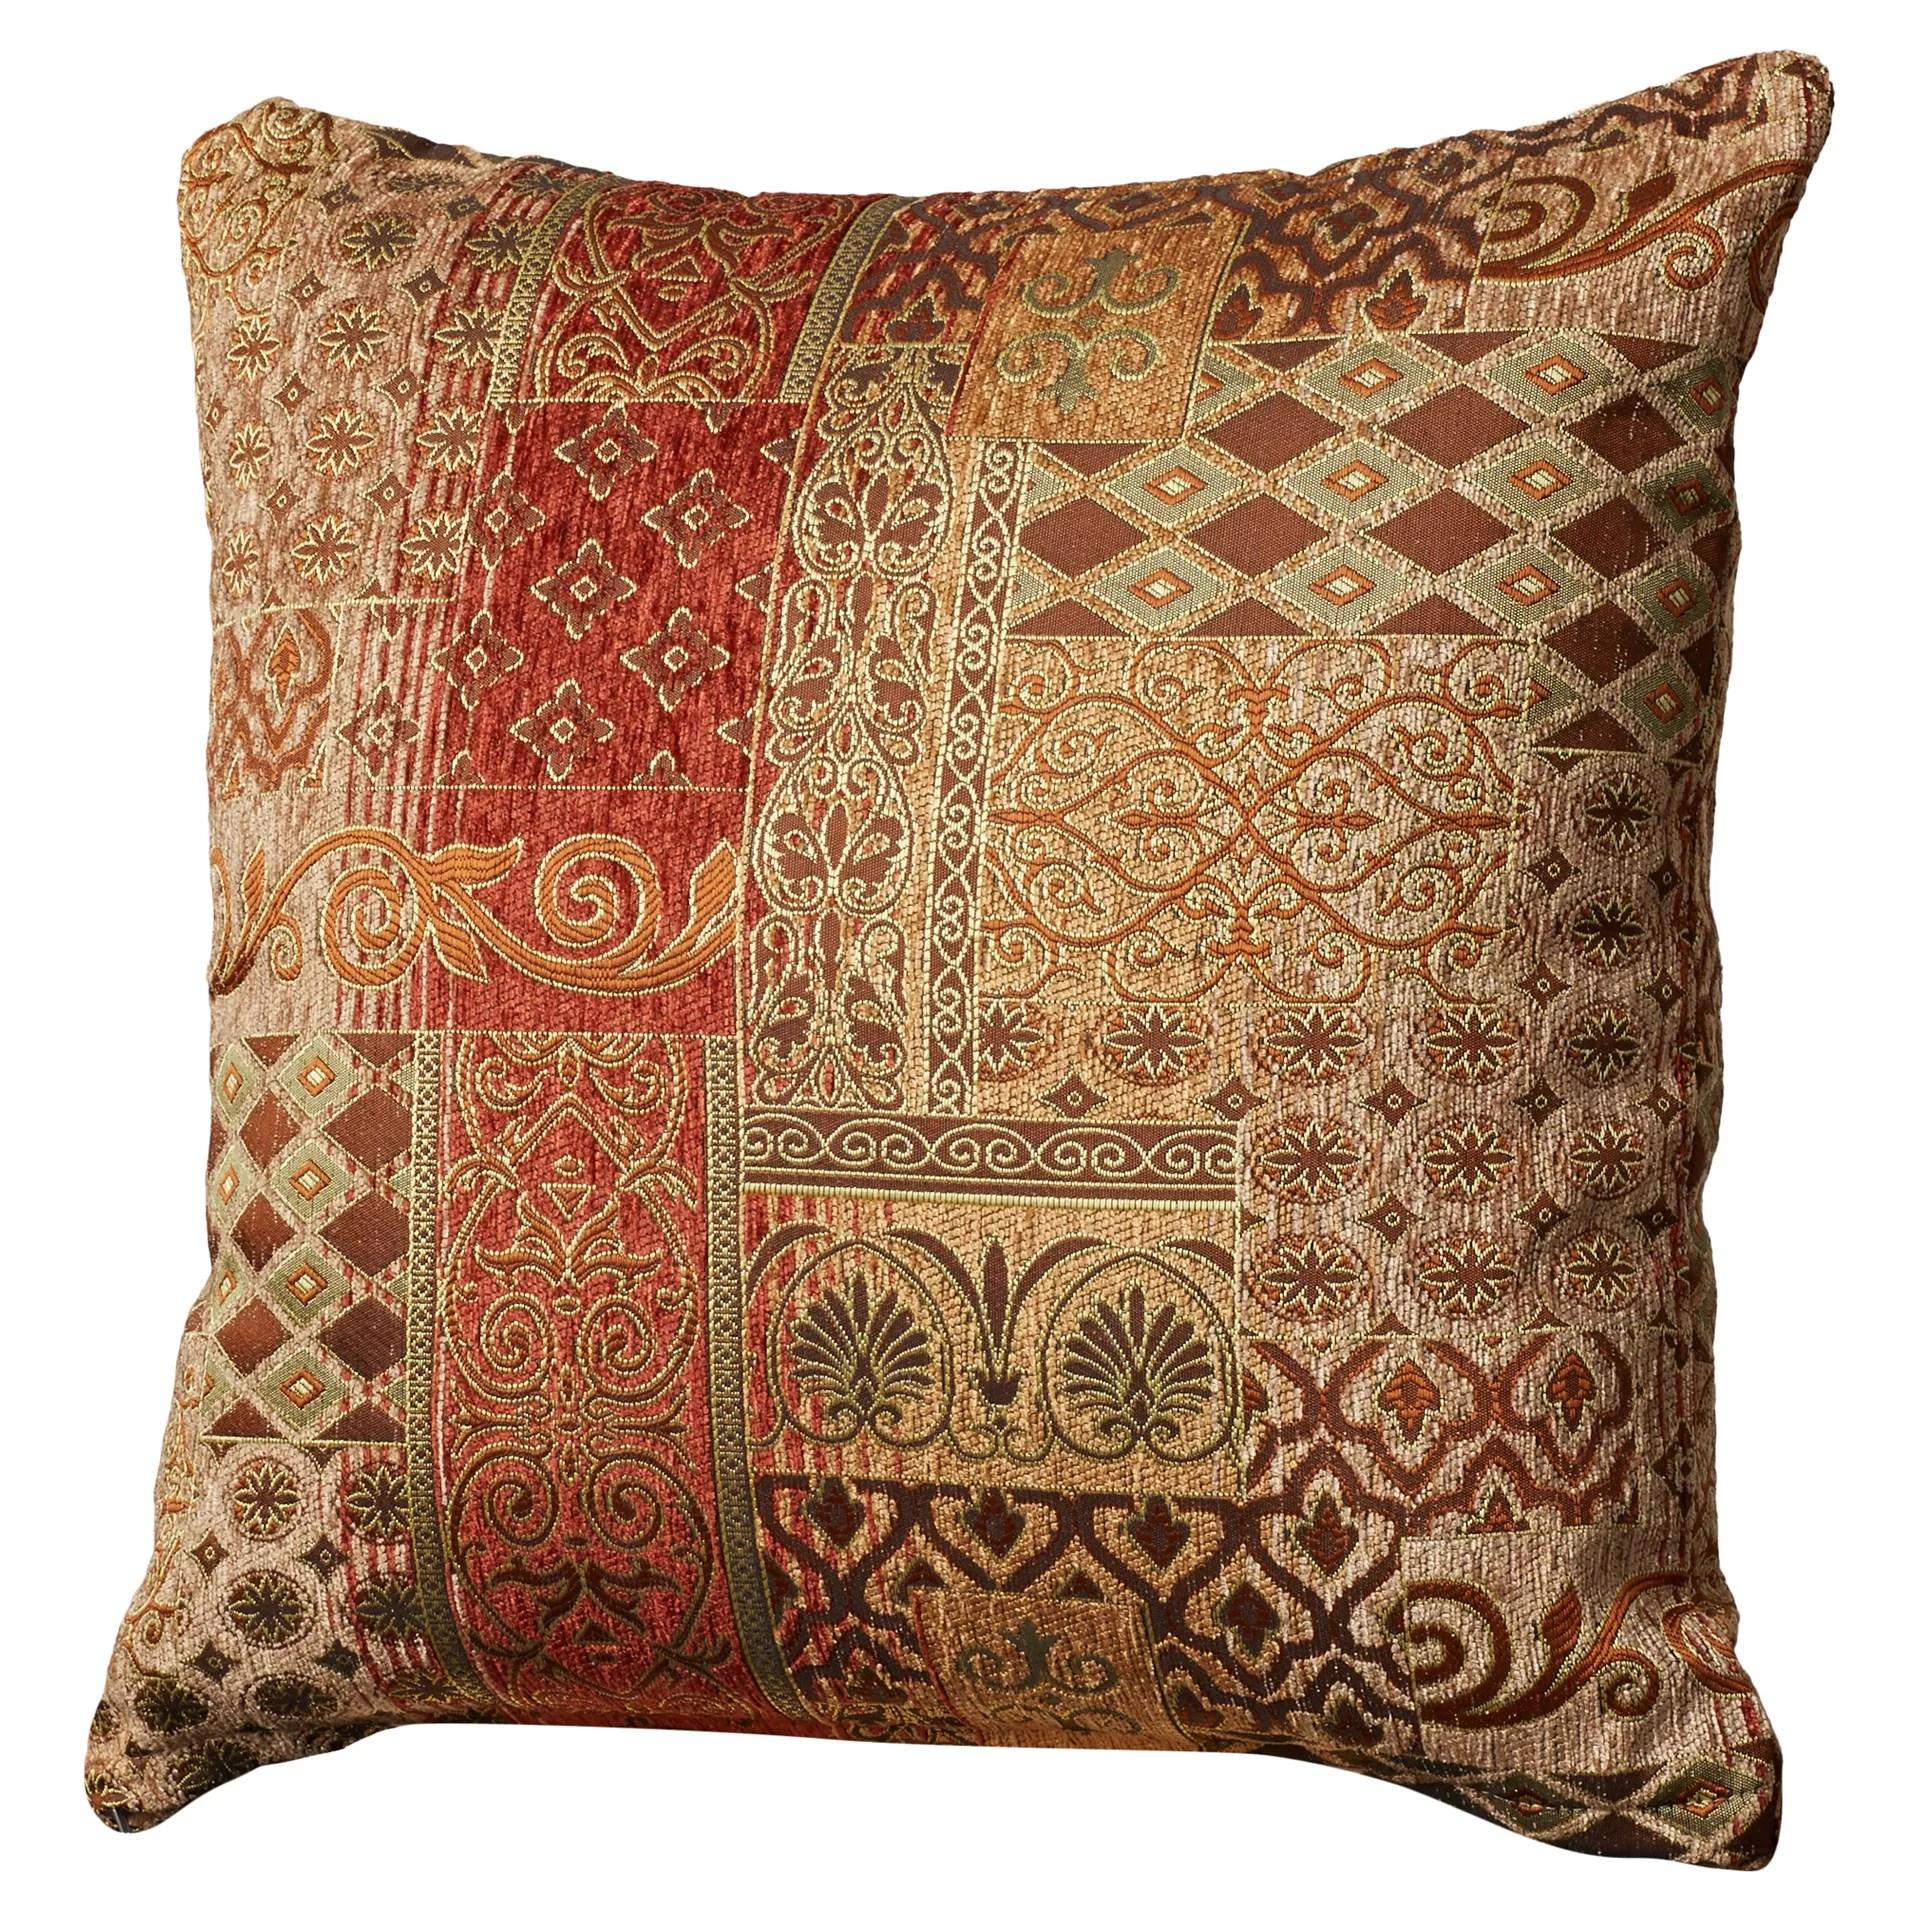 Bungalow Rose Lenzee Throw Pillow & Reviews